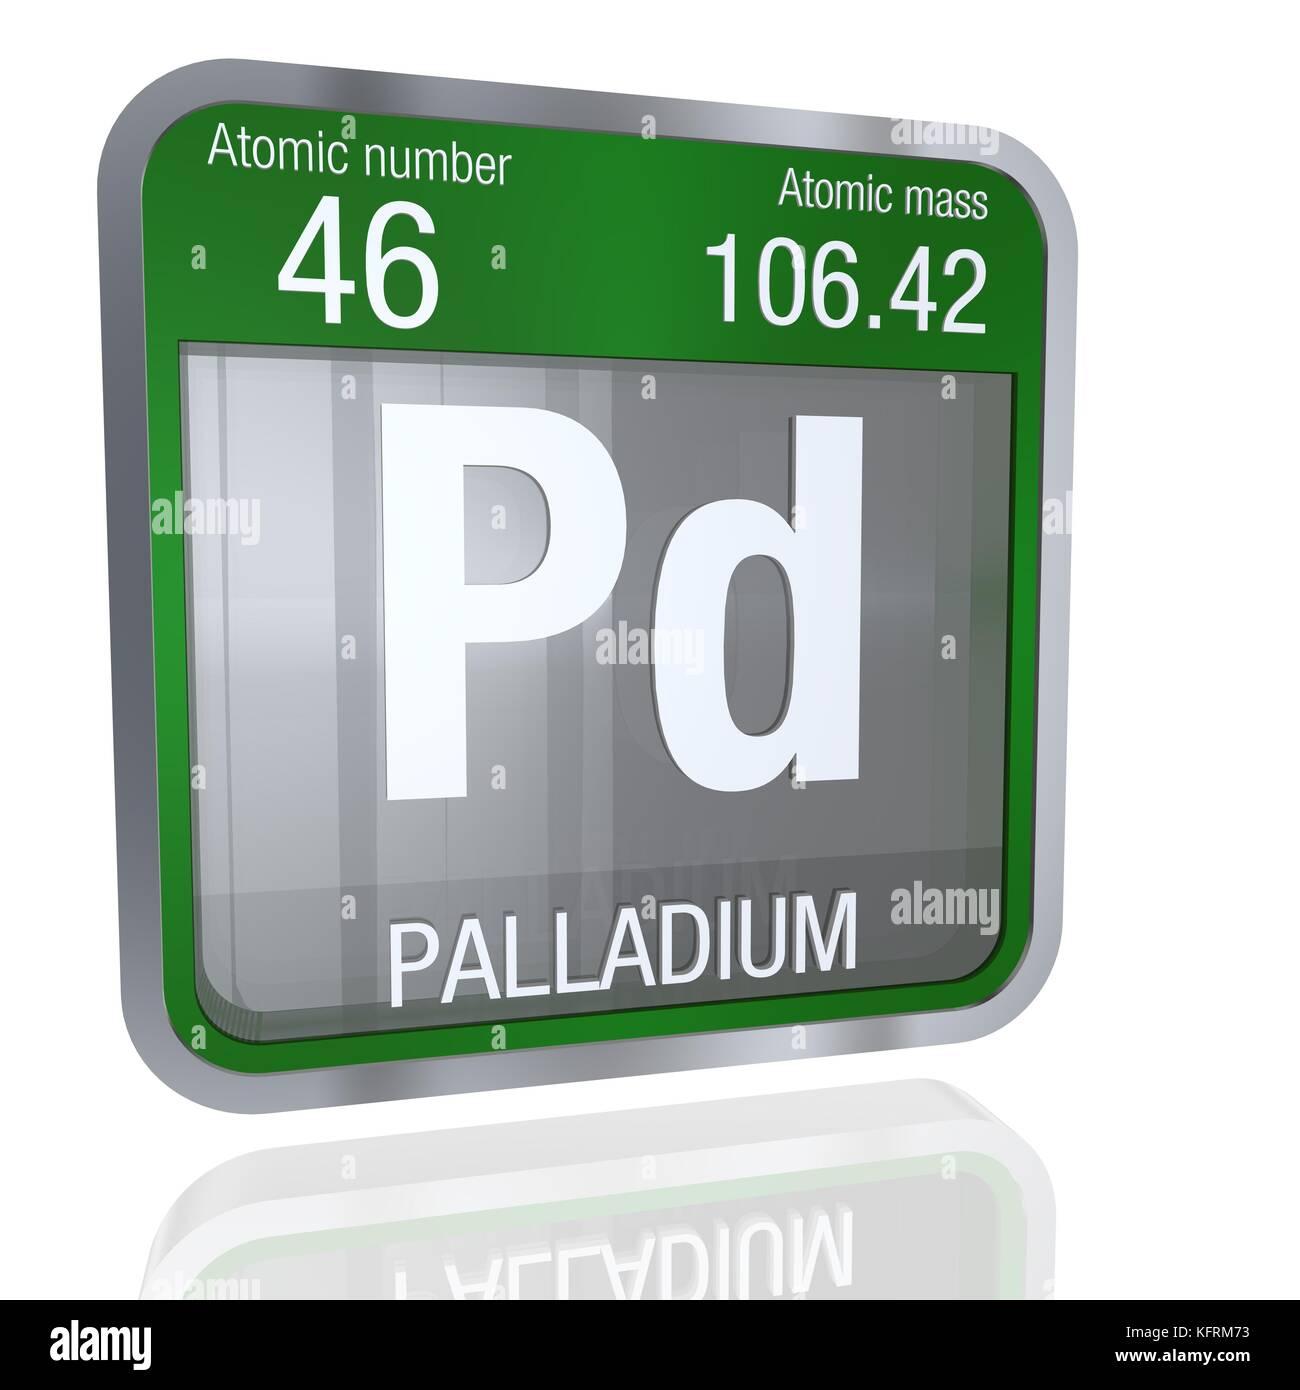 Palladium Symbol In Square Shape With Metallic Border And Stock